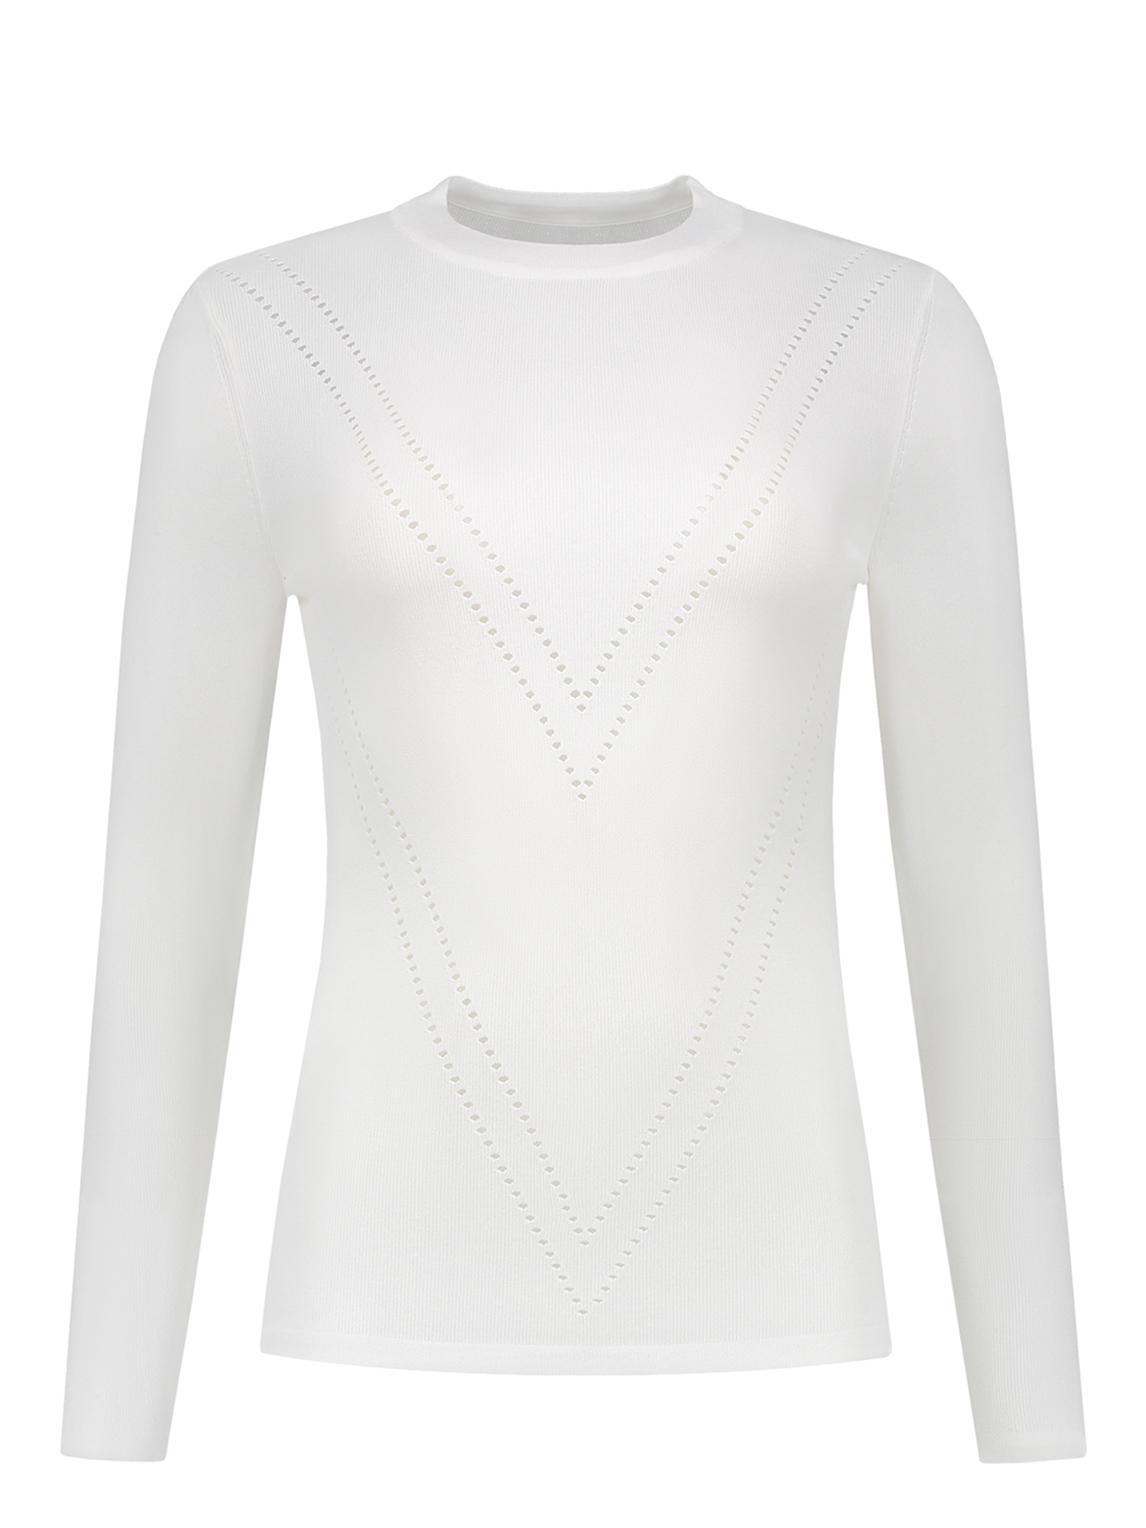 Witte dames top Nikkie Patty Top Solid - N7-866 1901 2000